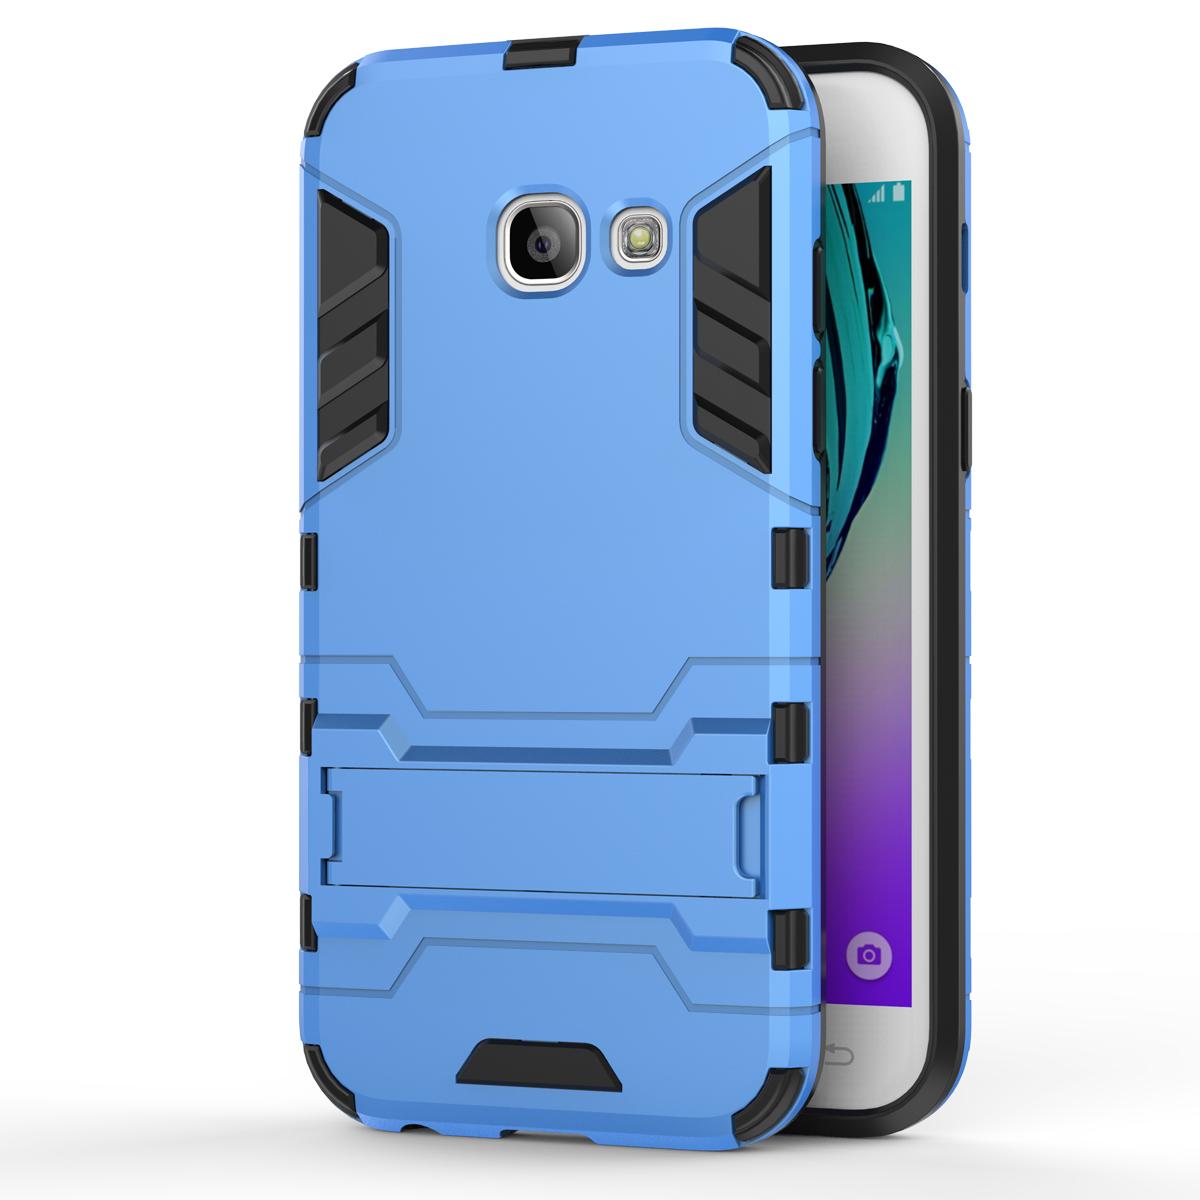 Armor Kickstand Protective Phone Cover Case for Samsung Galaxy A3 (2017) - Blue